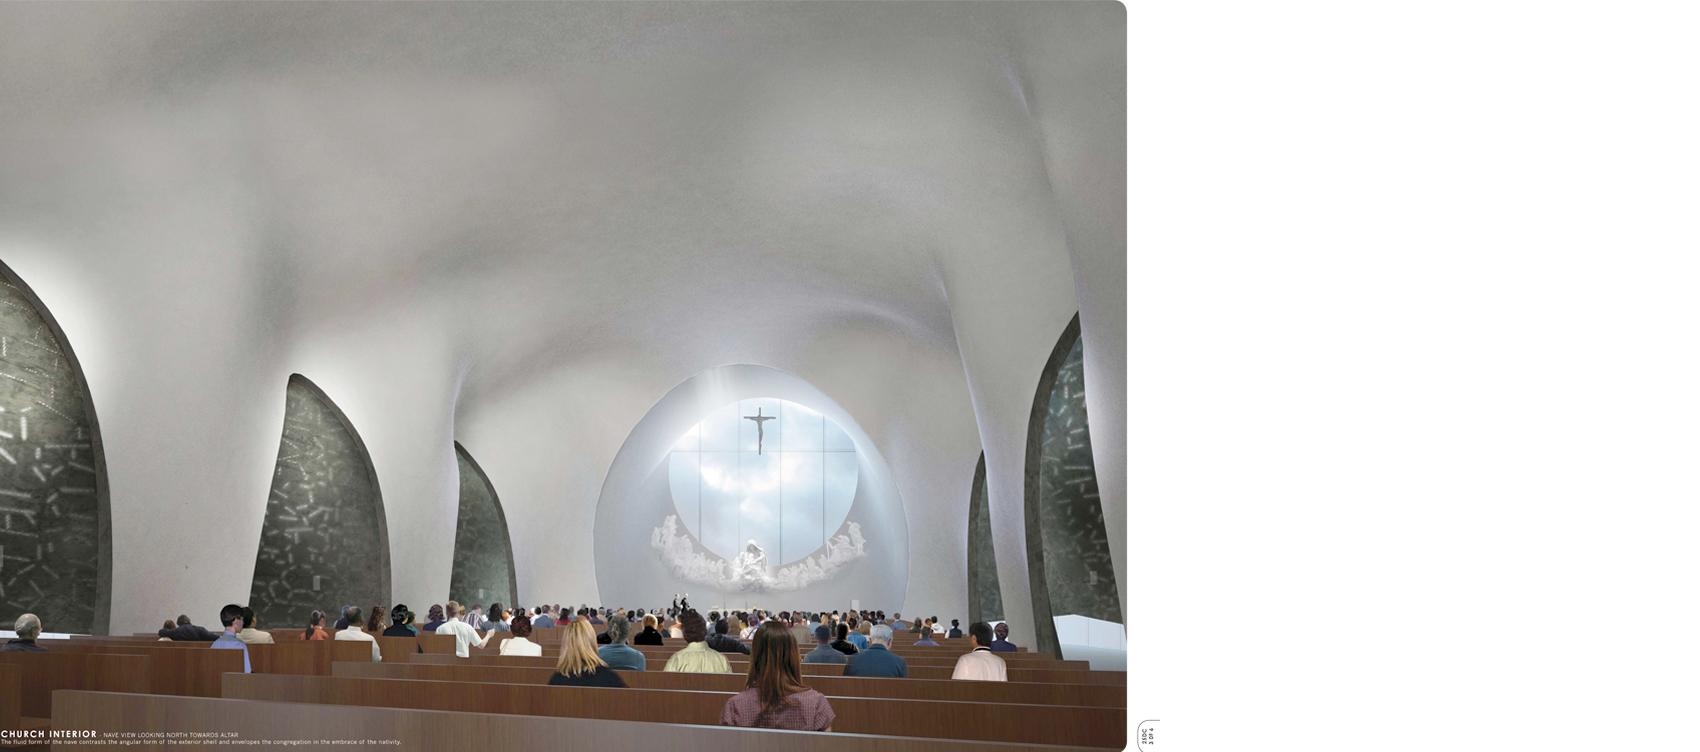 church 02.jpg